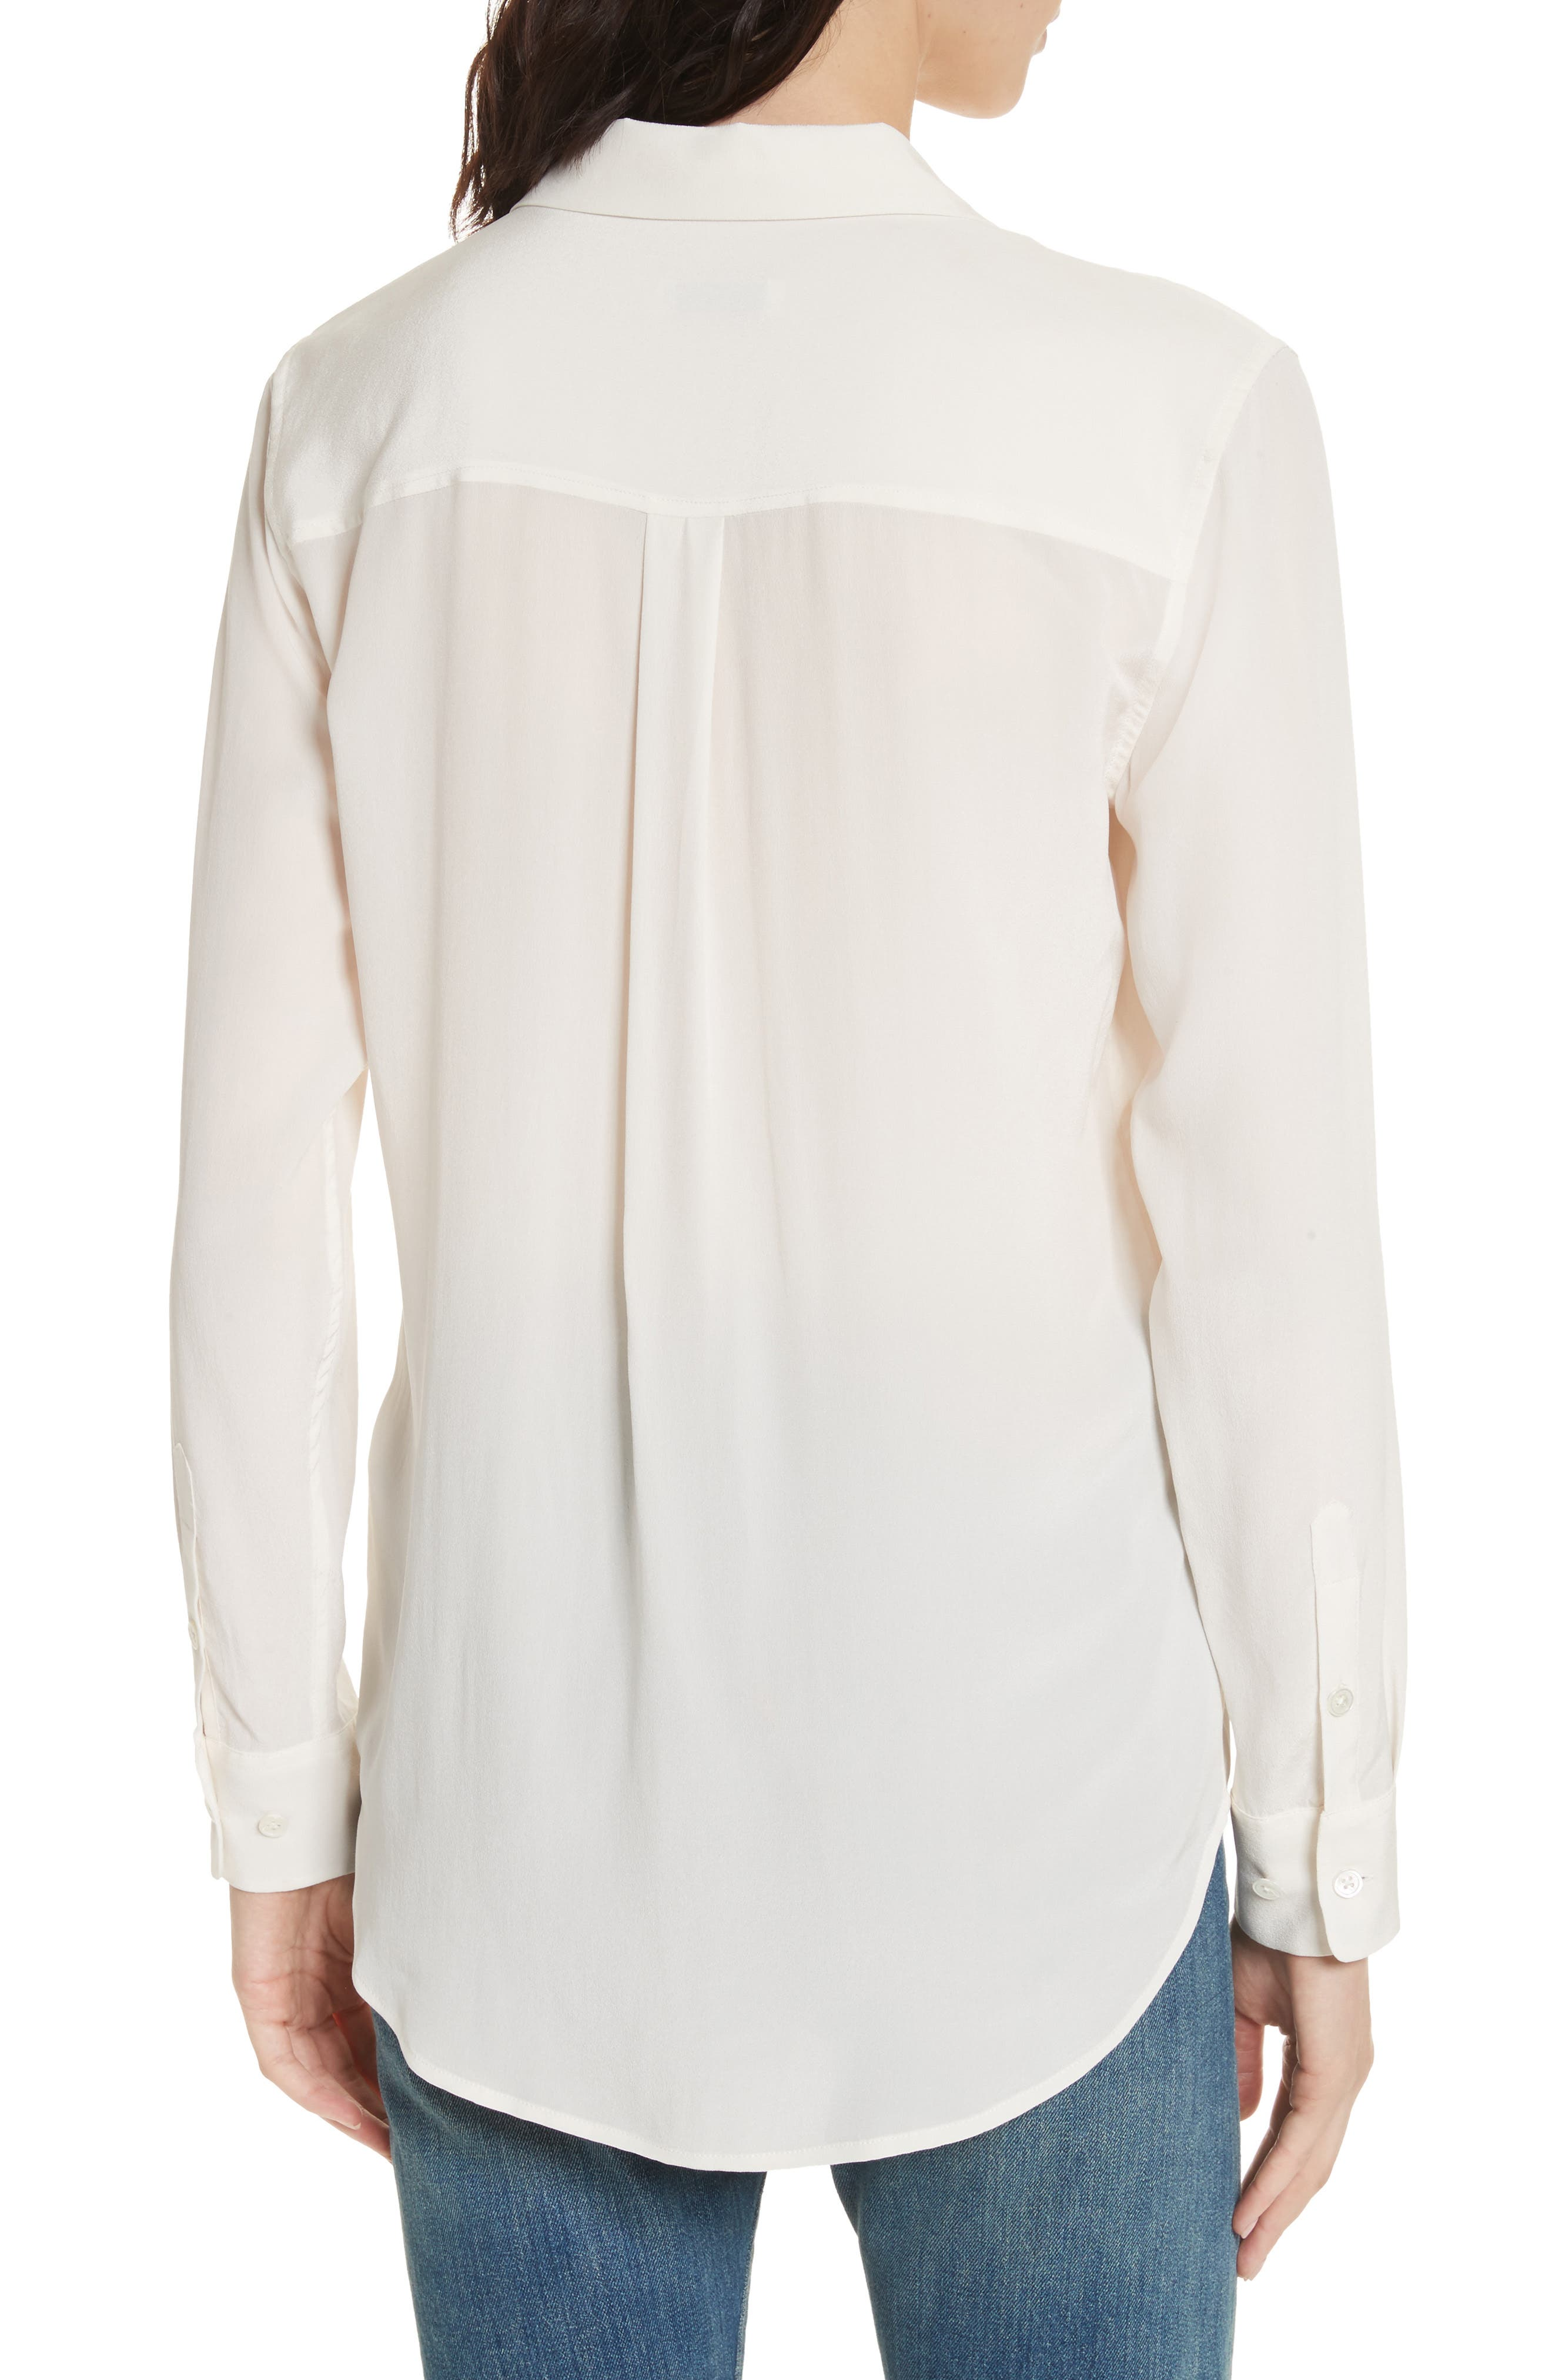 EQUIPMENT,                             'Slim Signature' Silk Shirt,                             Alternate thumbnail 2, color,                             BRIGHT WHITE